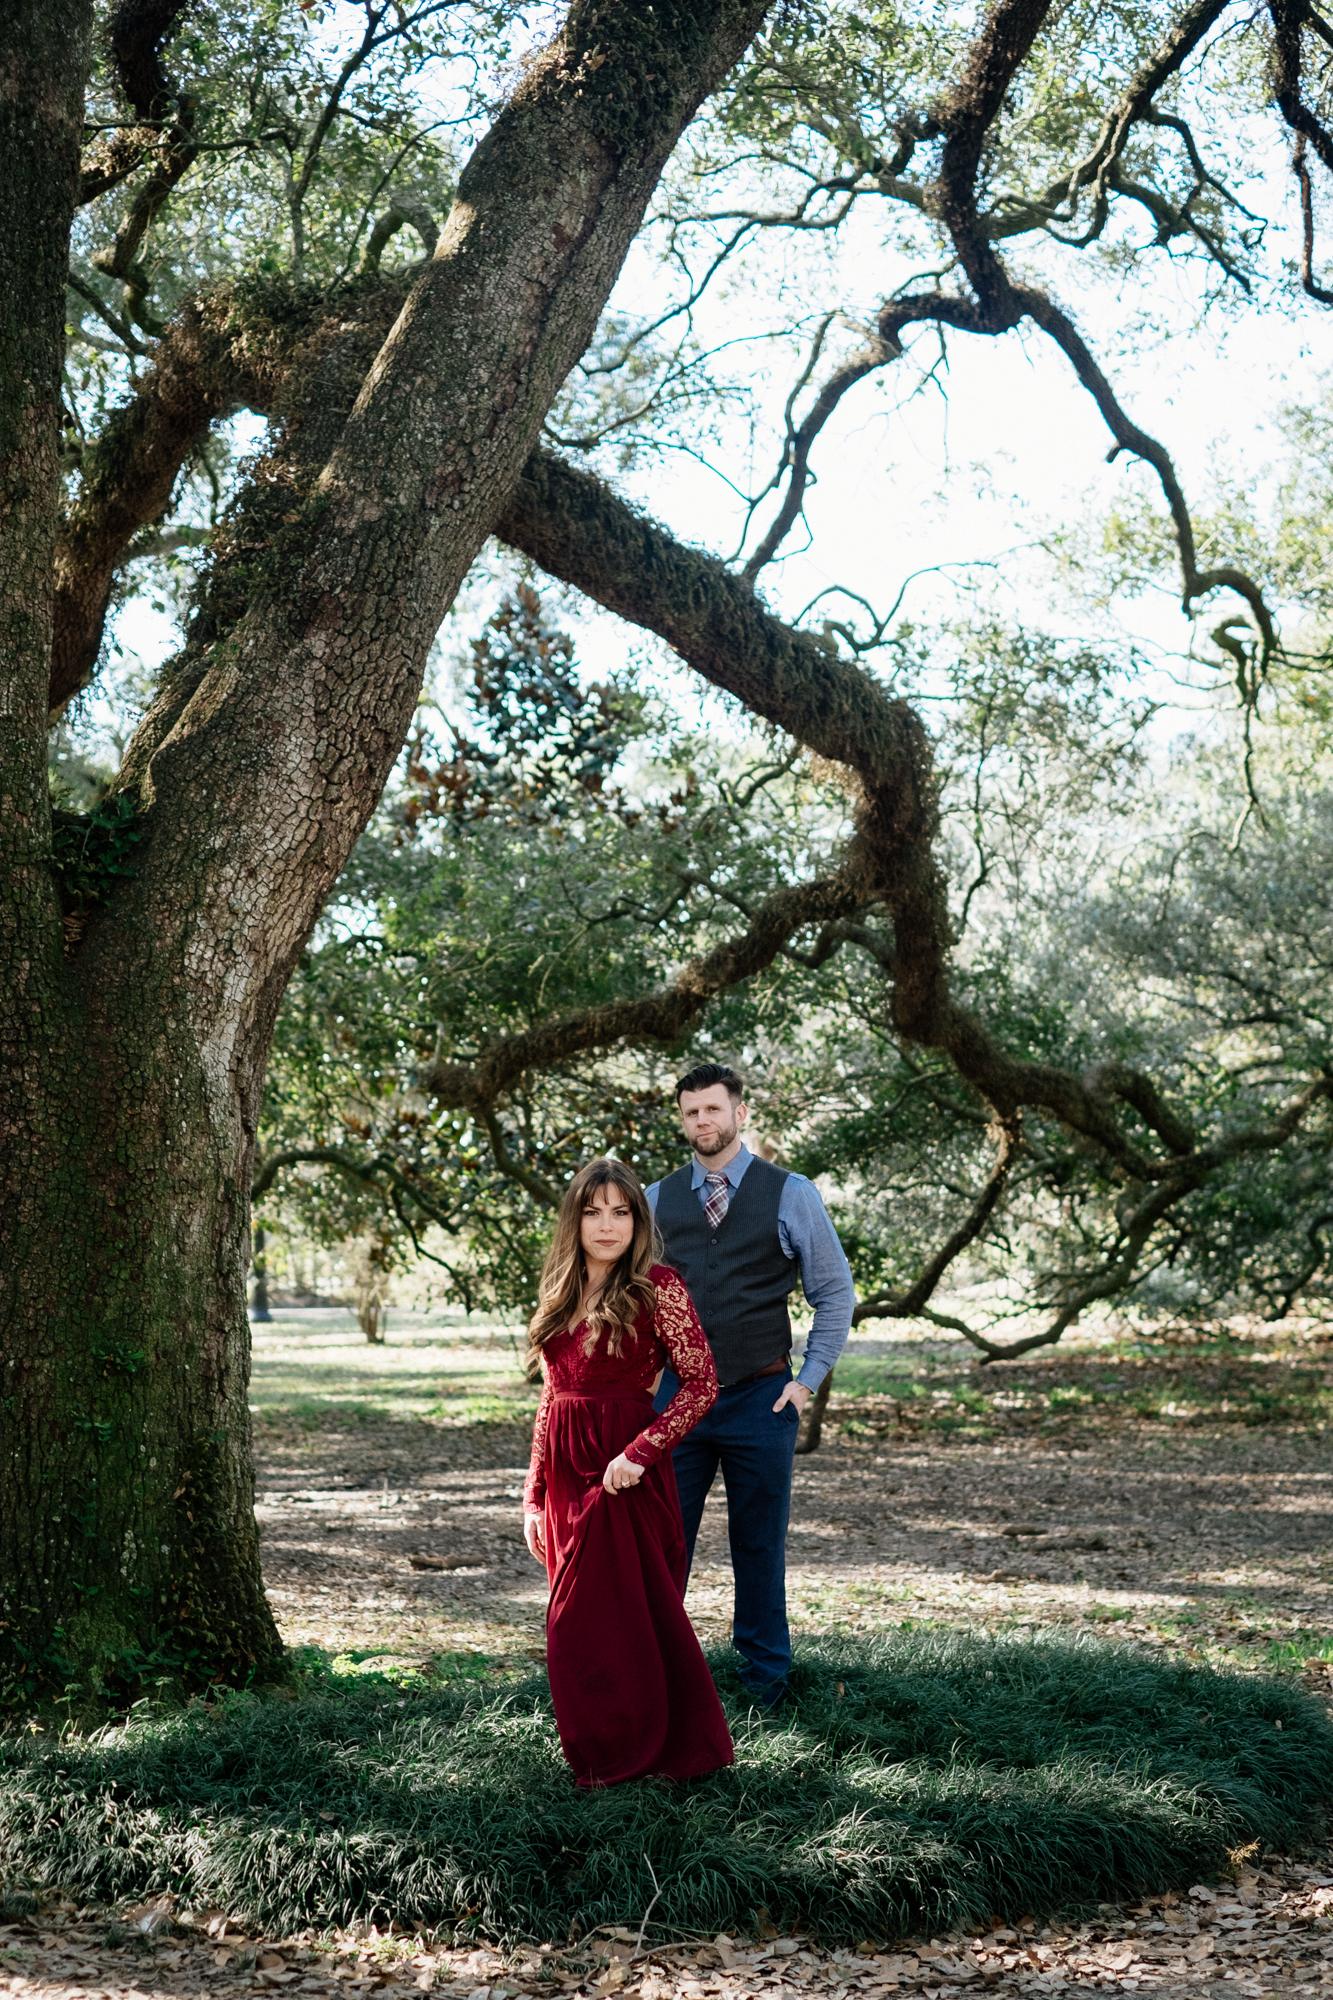 Jen_Montgomery_Photography_Angela_Brian_Engagement_Proposal_FB-208.jpg